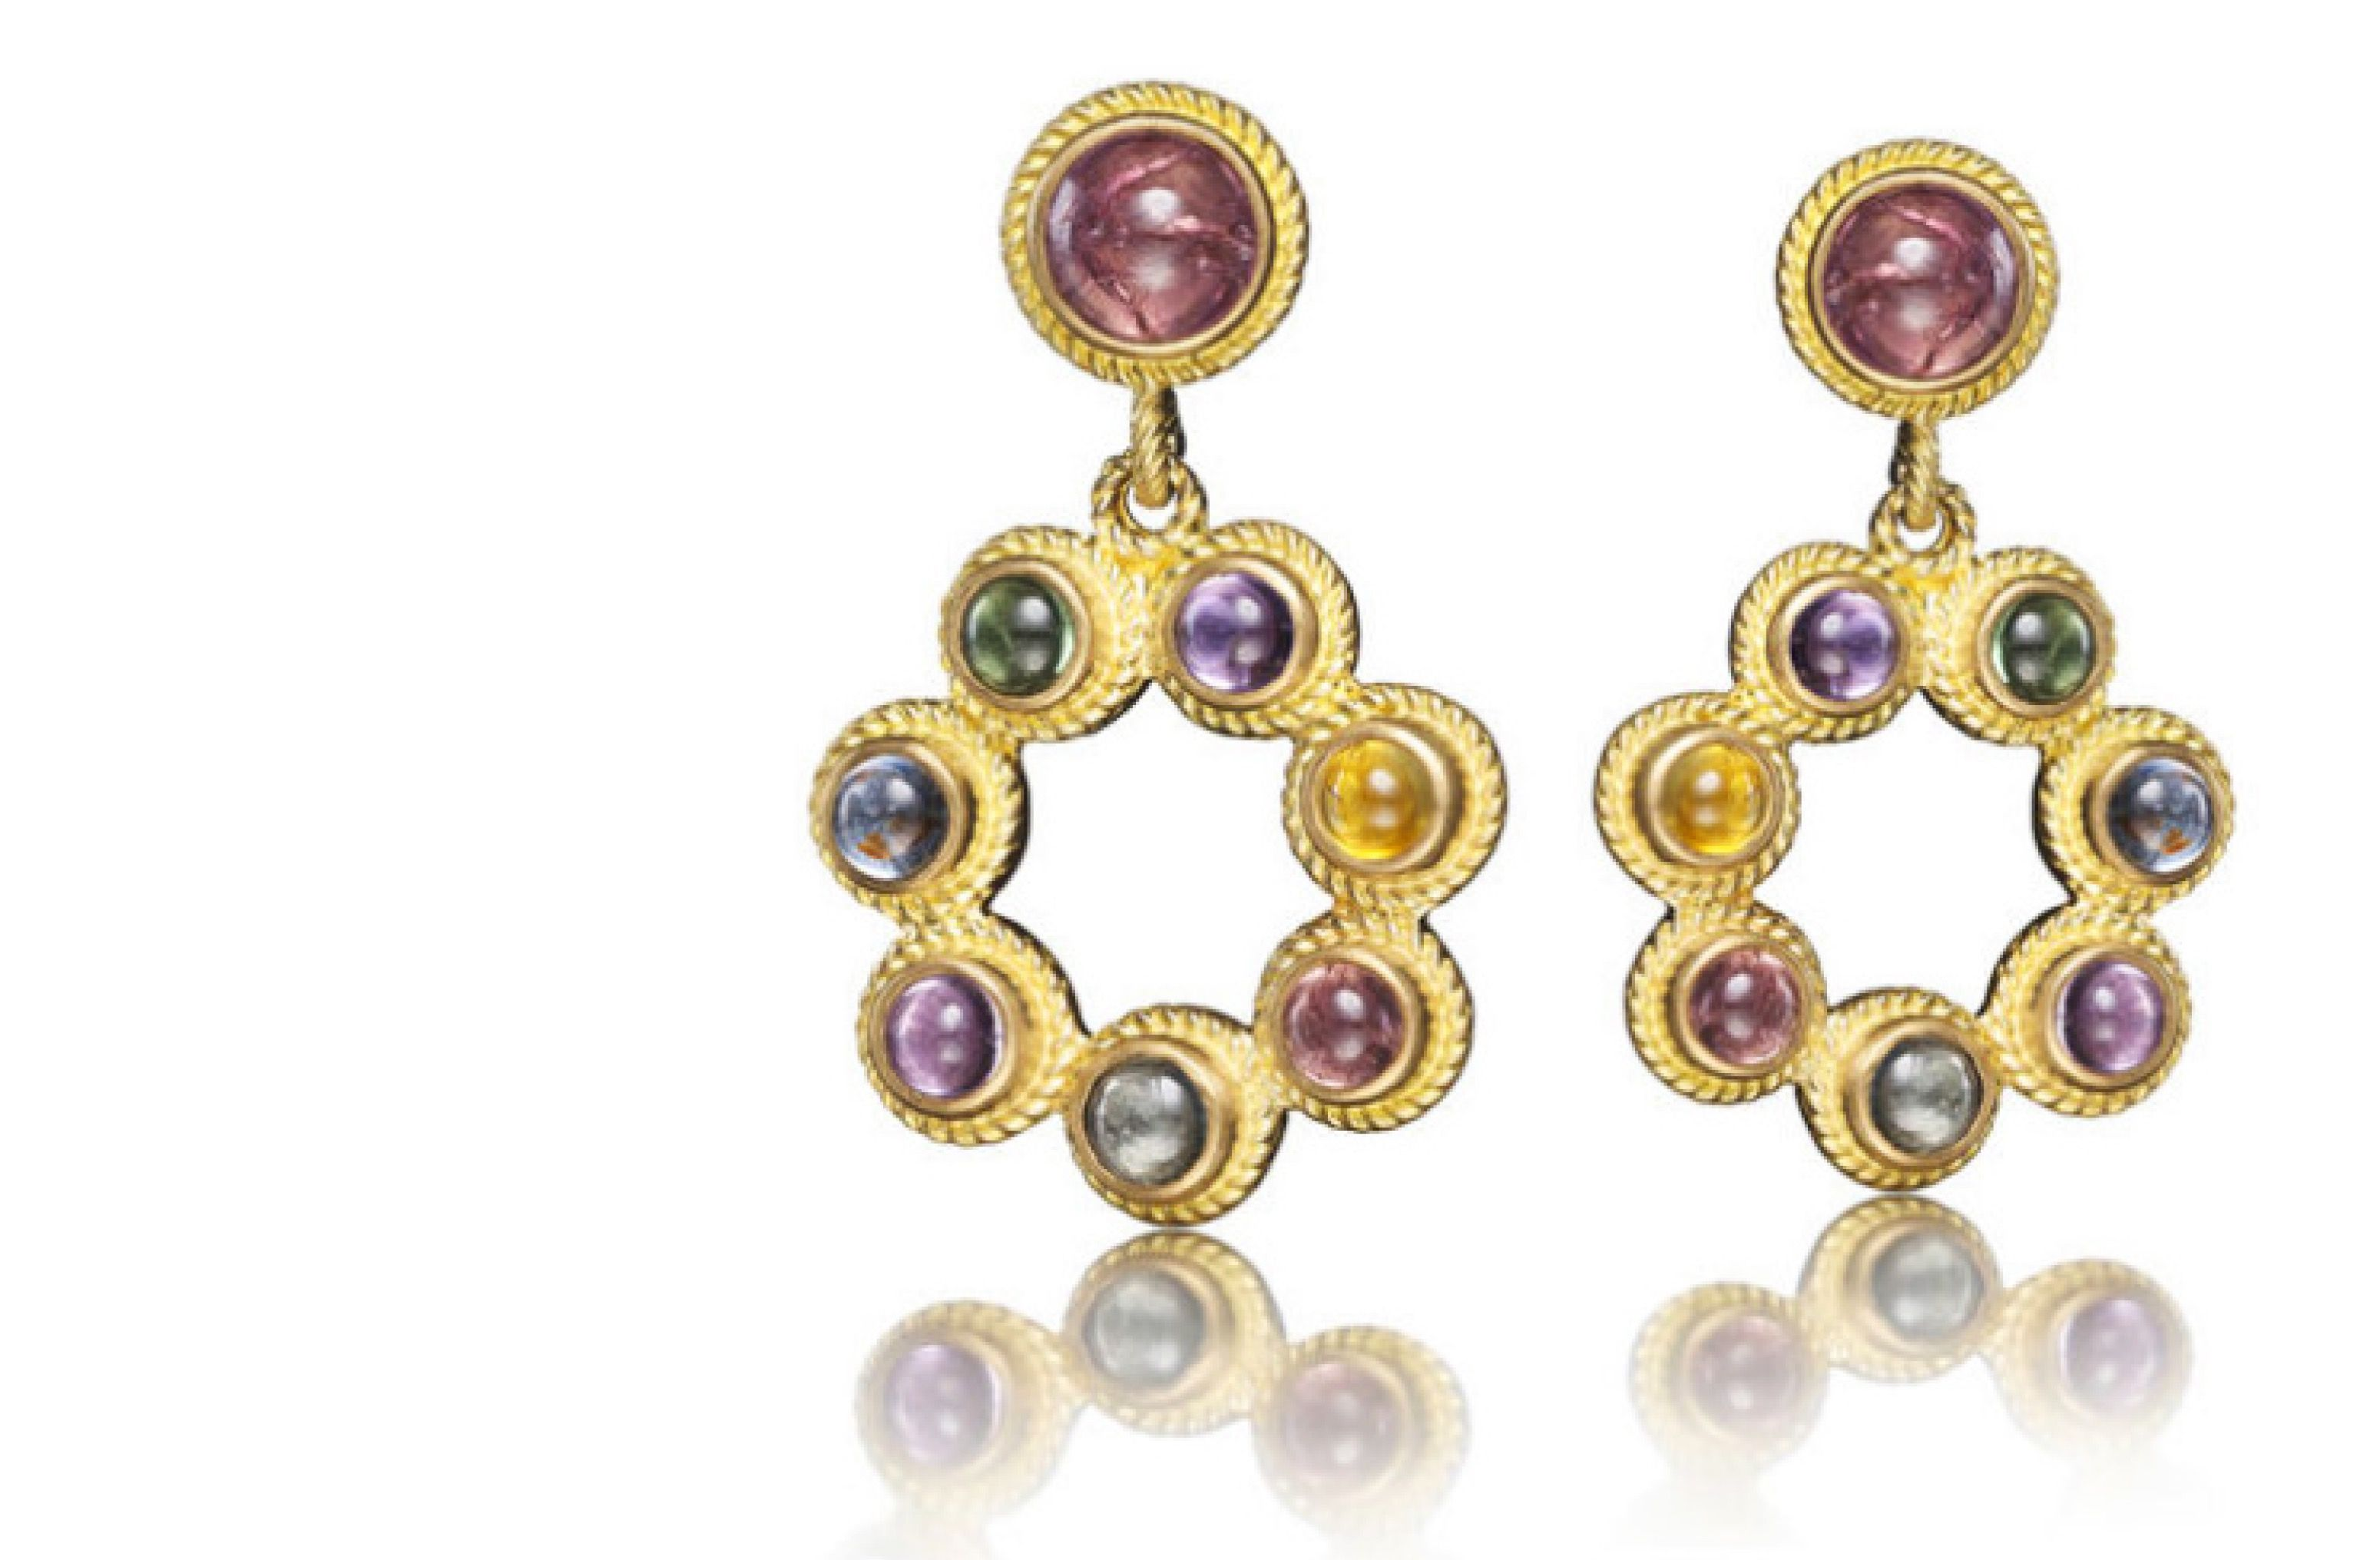 JewelryWhite_21.jpg